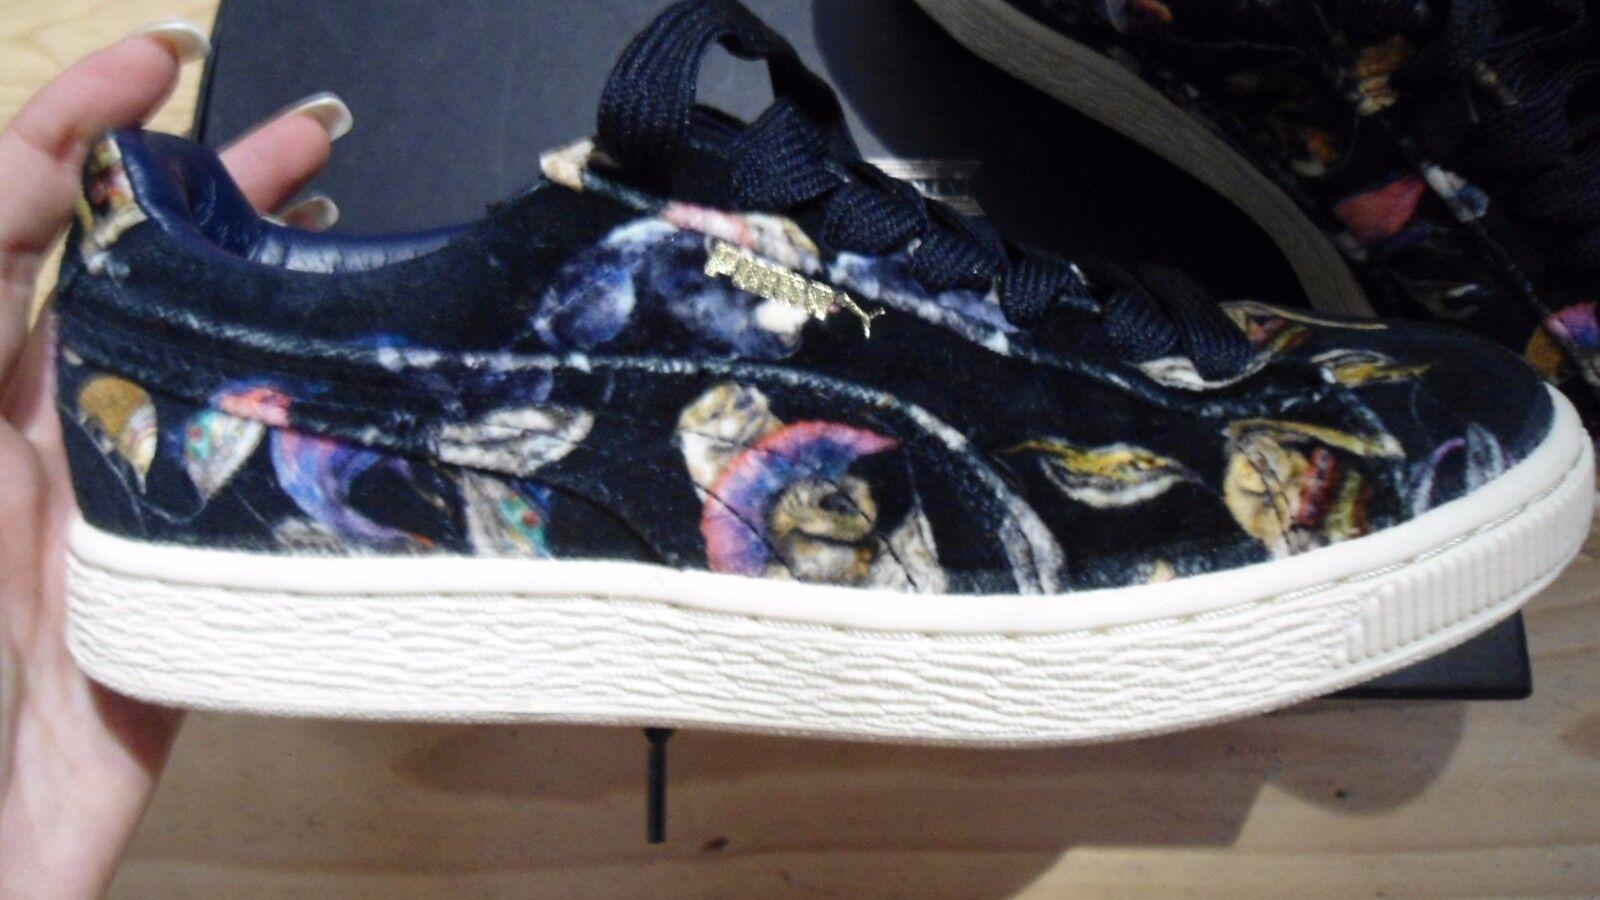 Lujo Puma Sneaker Limited Edition terciopelo Velvet negro ha fallado